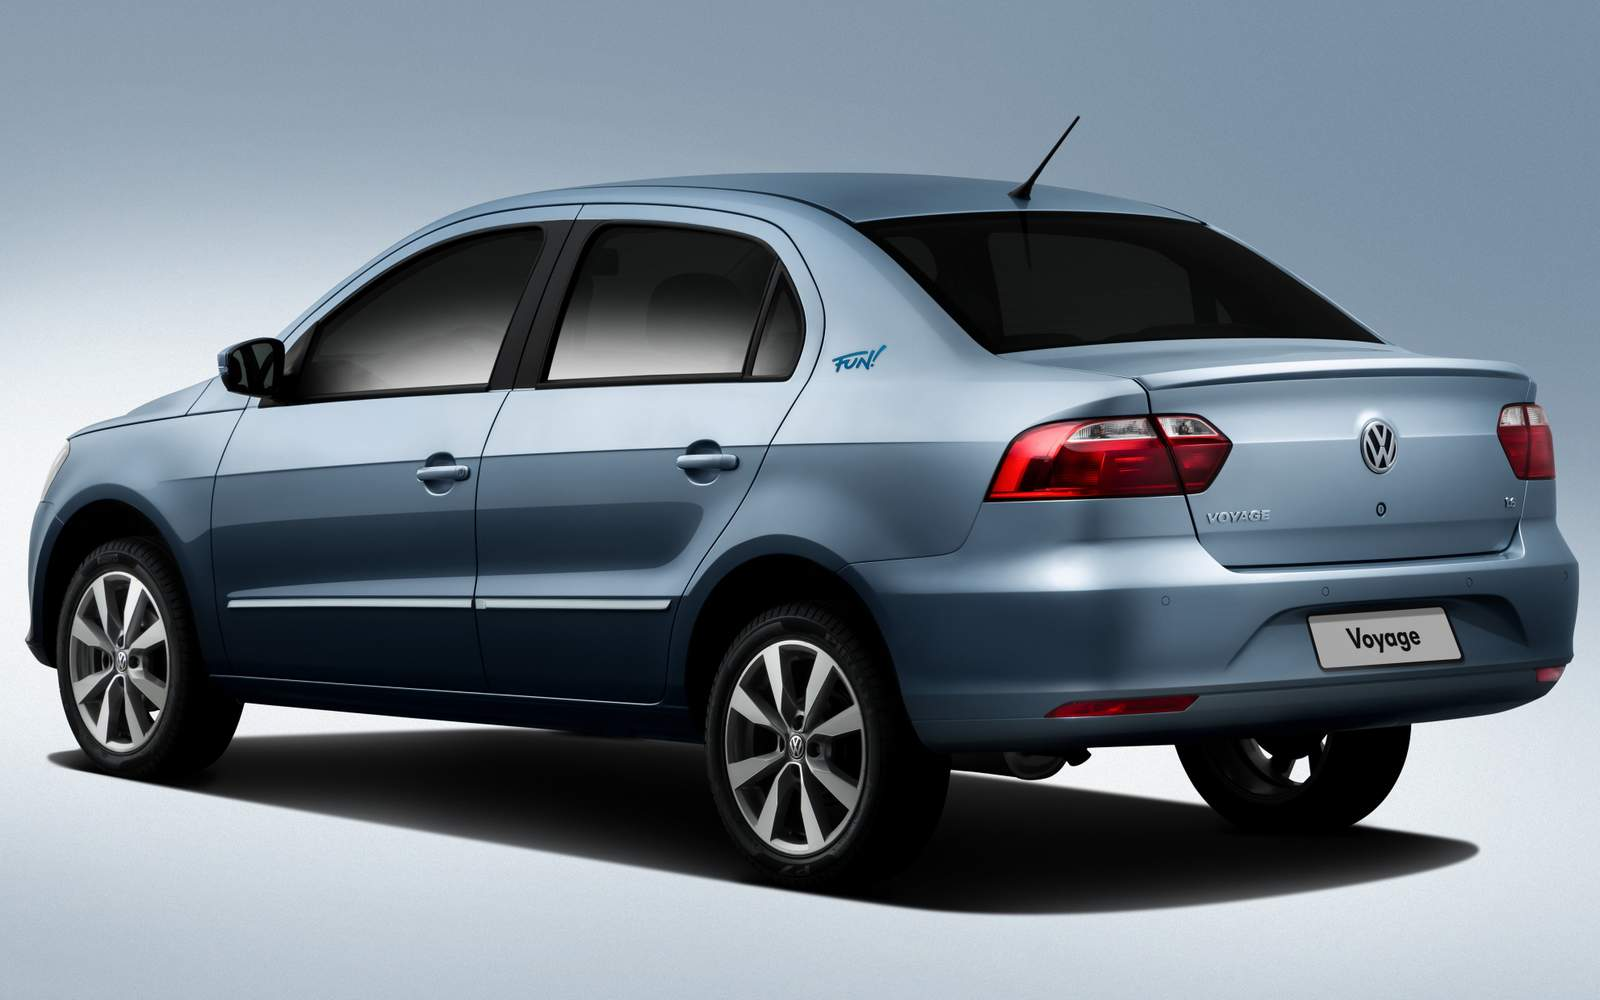 Novo VW Voyage G6 2015 - Comfortline